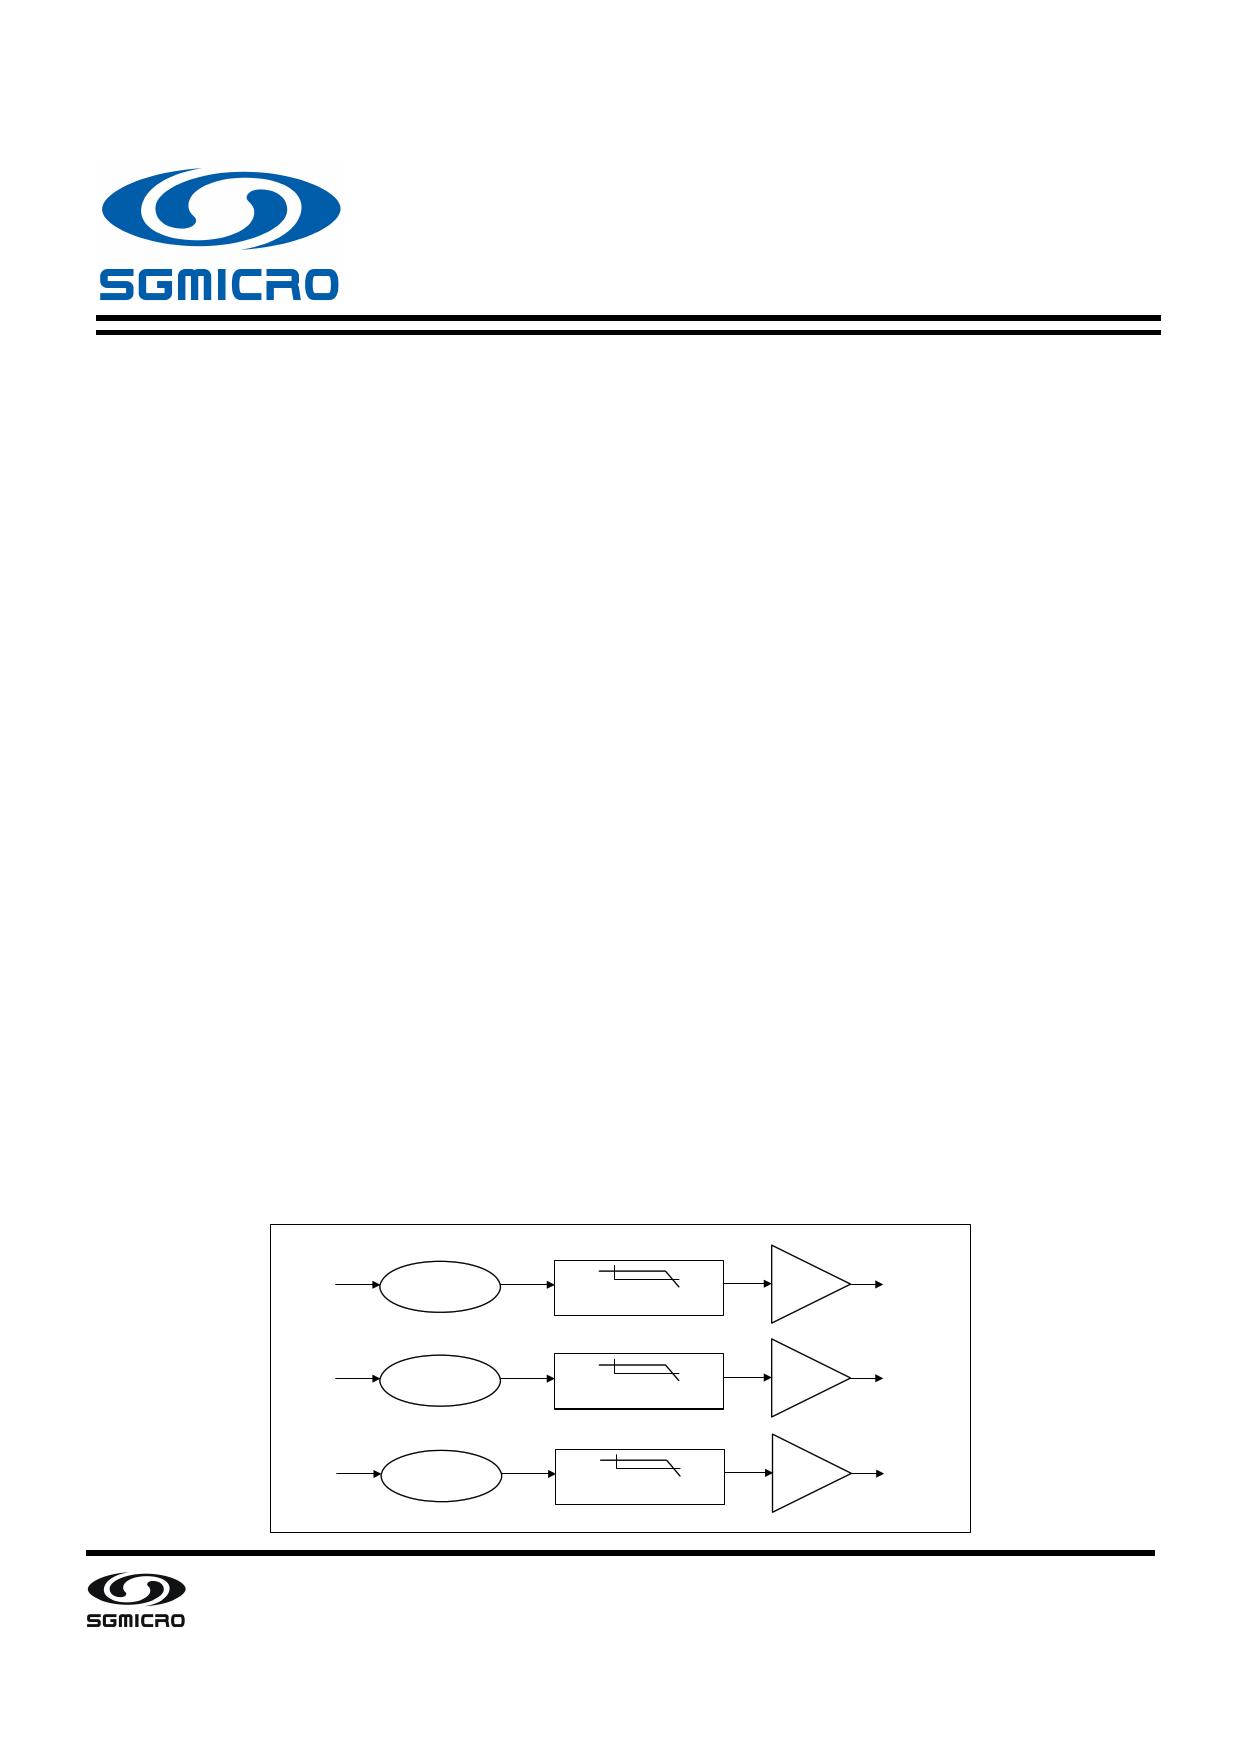 SGM9119 datasheet, circuit